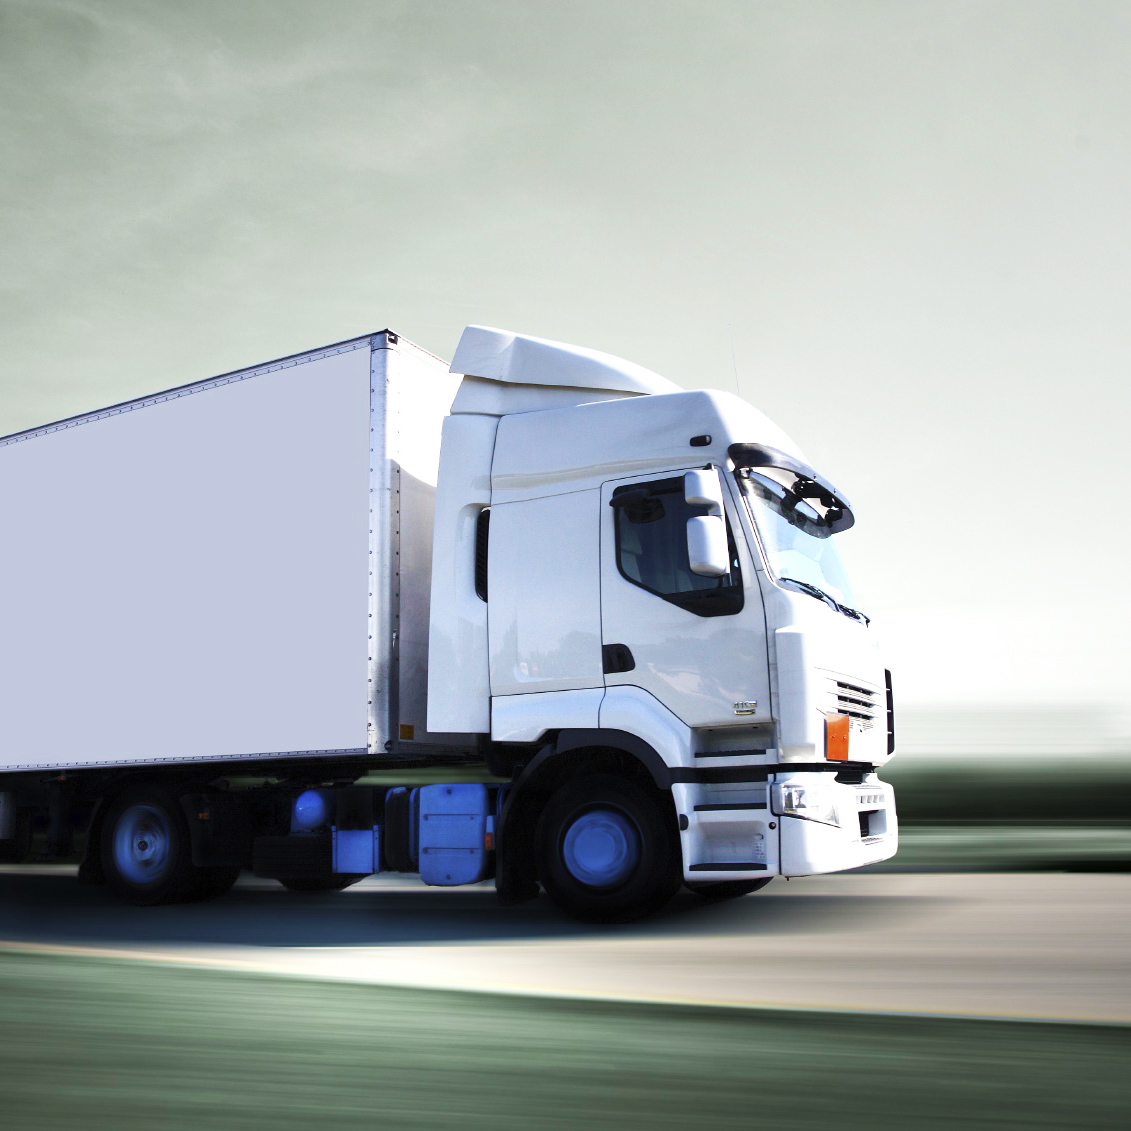 truck-picture-EDIT